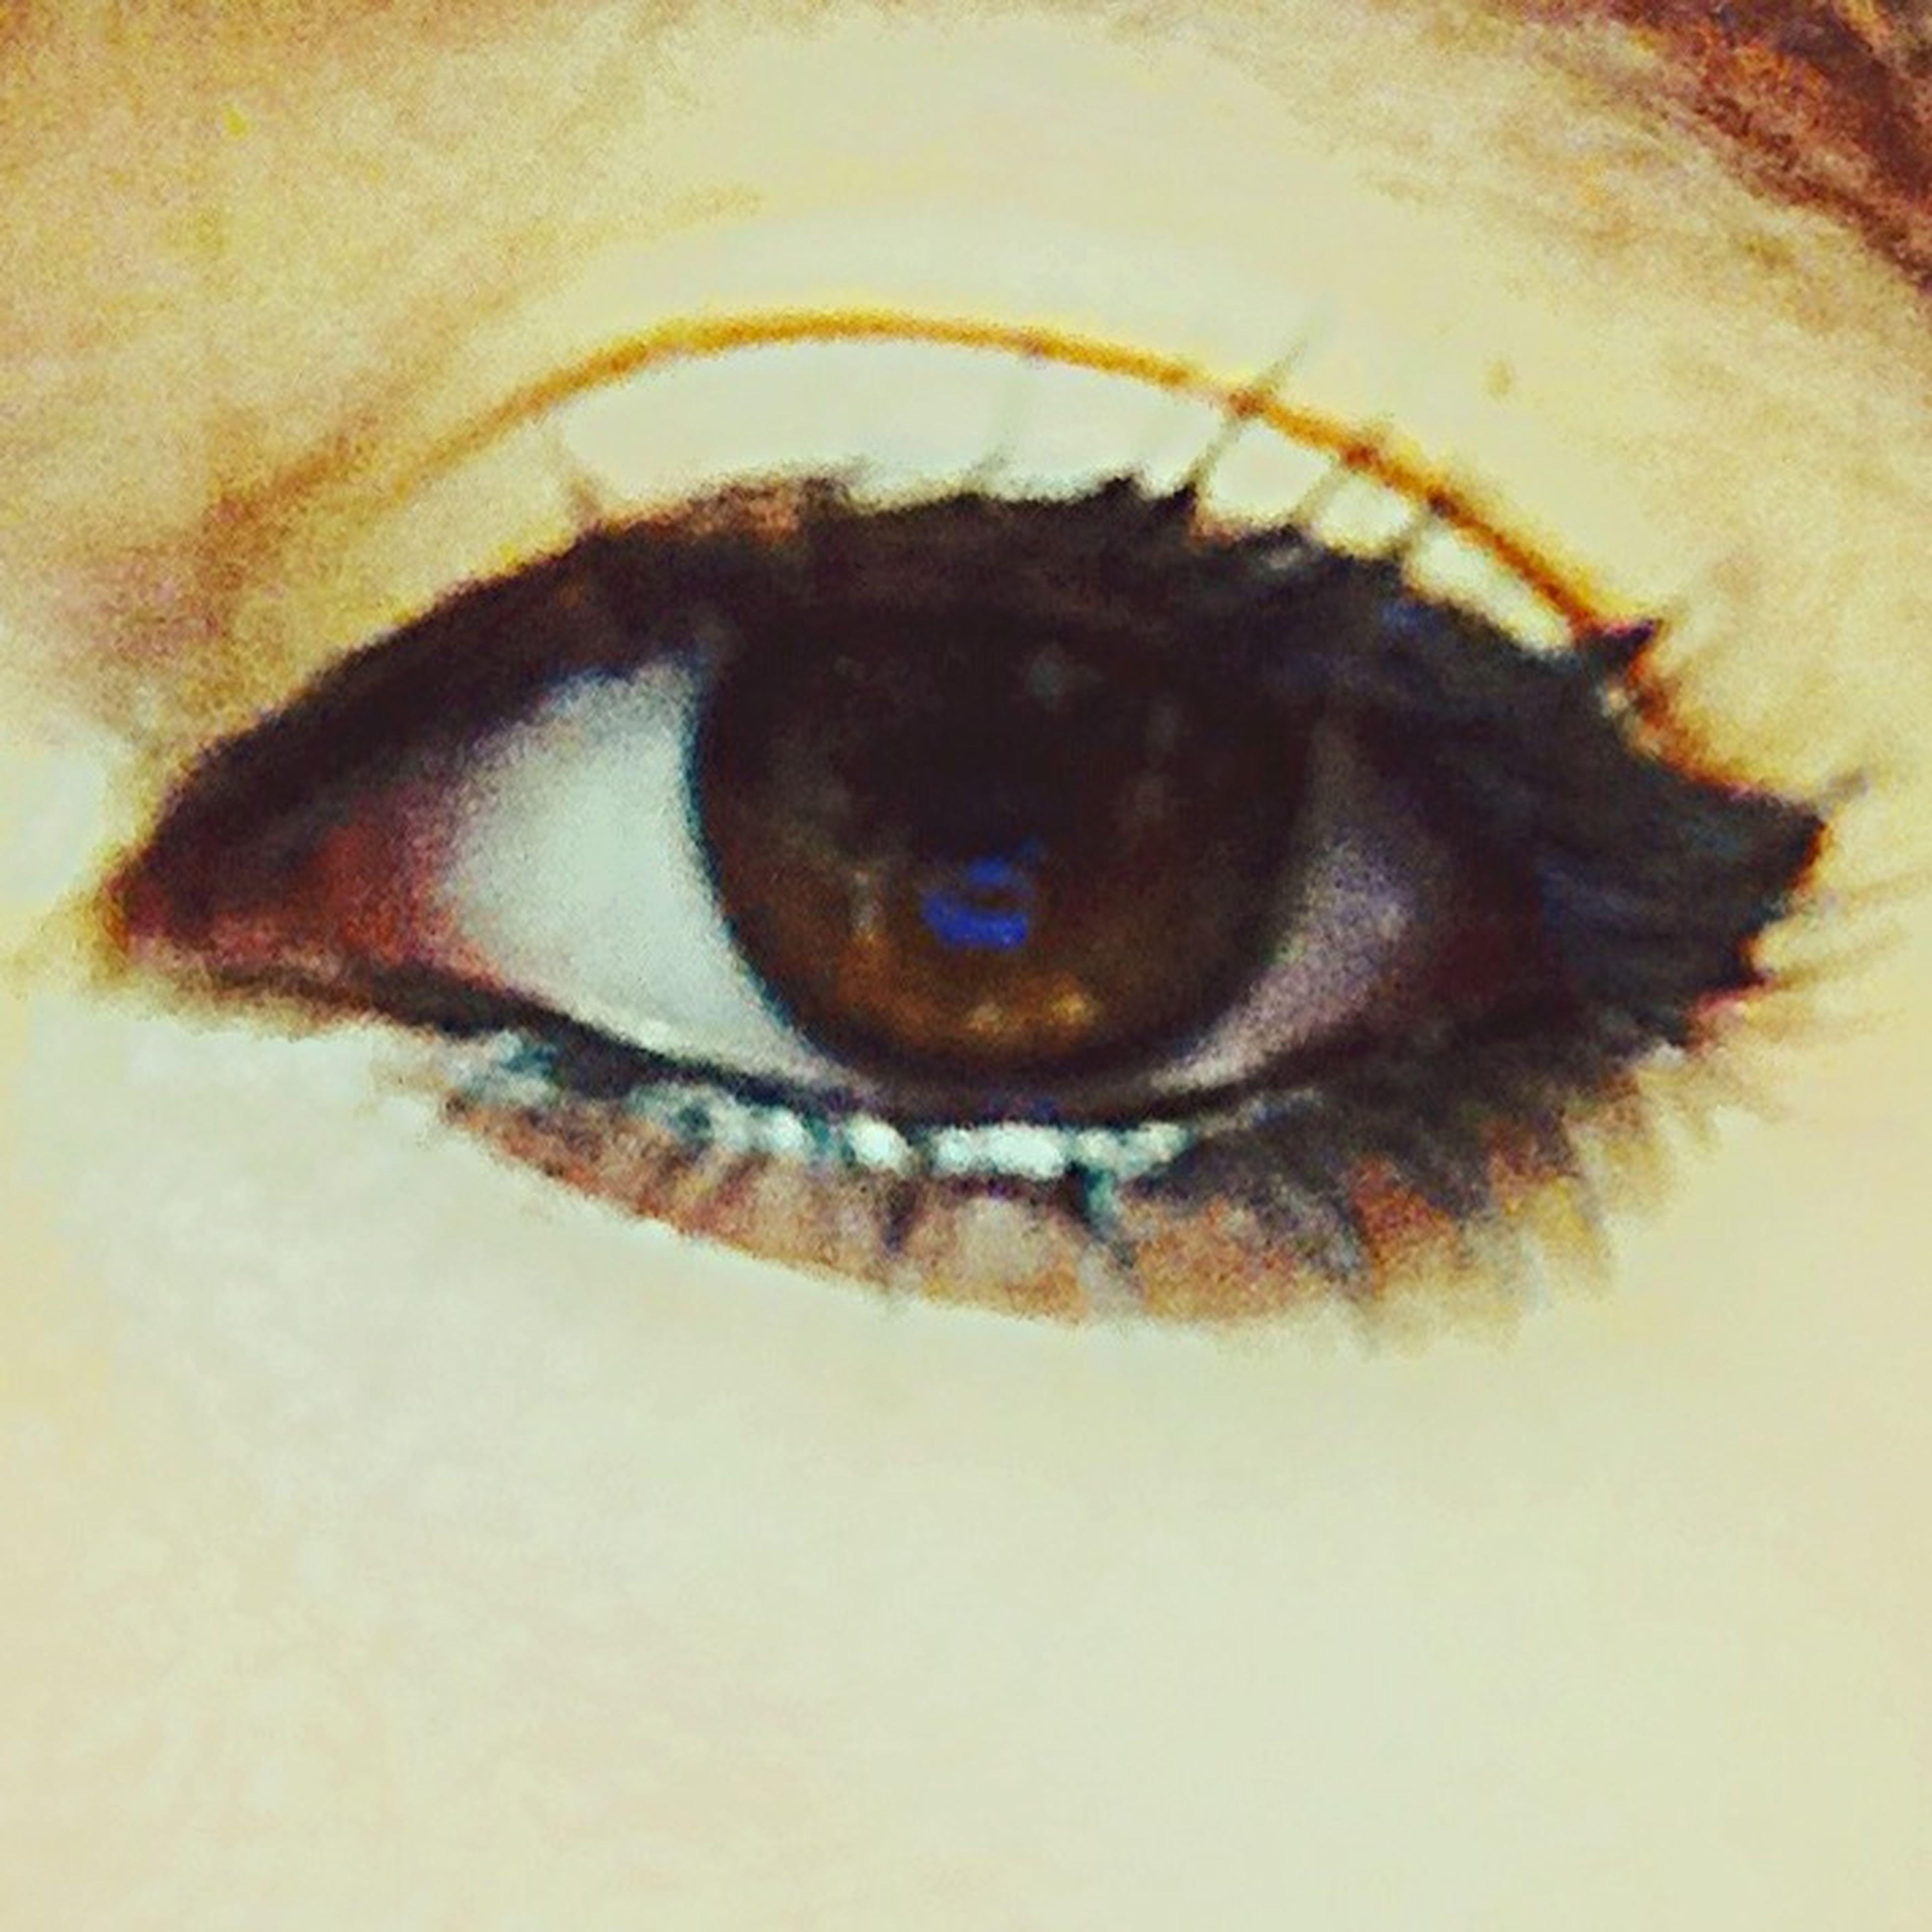 human eye, close-up, eyelash, looking at camera, portrait, indoors, eyesight, extreme close-up, sensory perception, eyeball, extreme close up, part of, iris - eye, human skin, human face, one animal, unrecognizable person